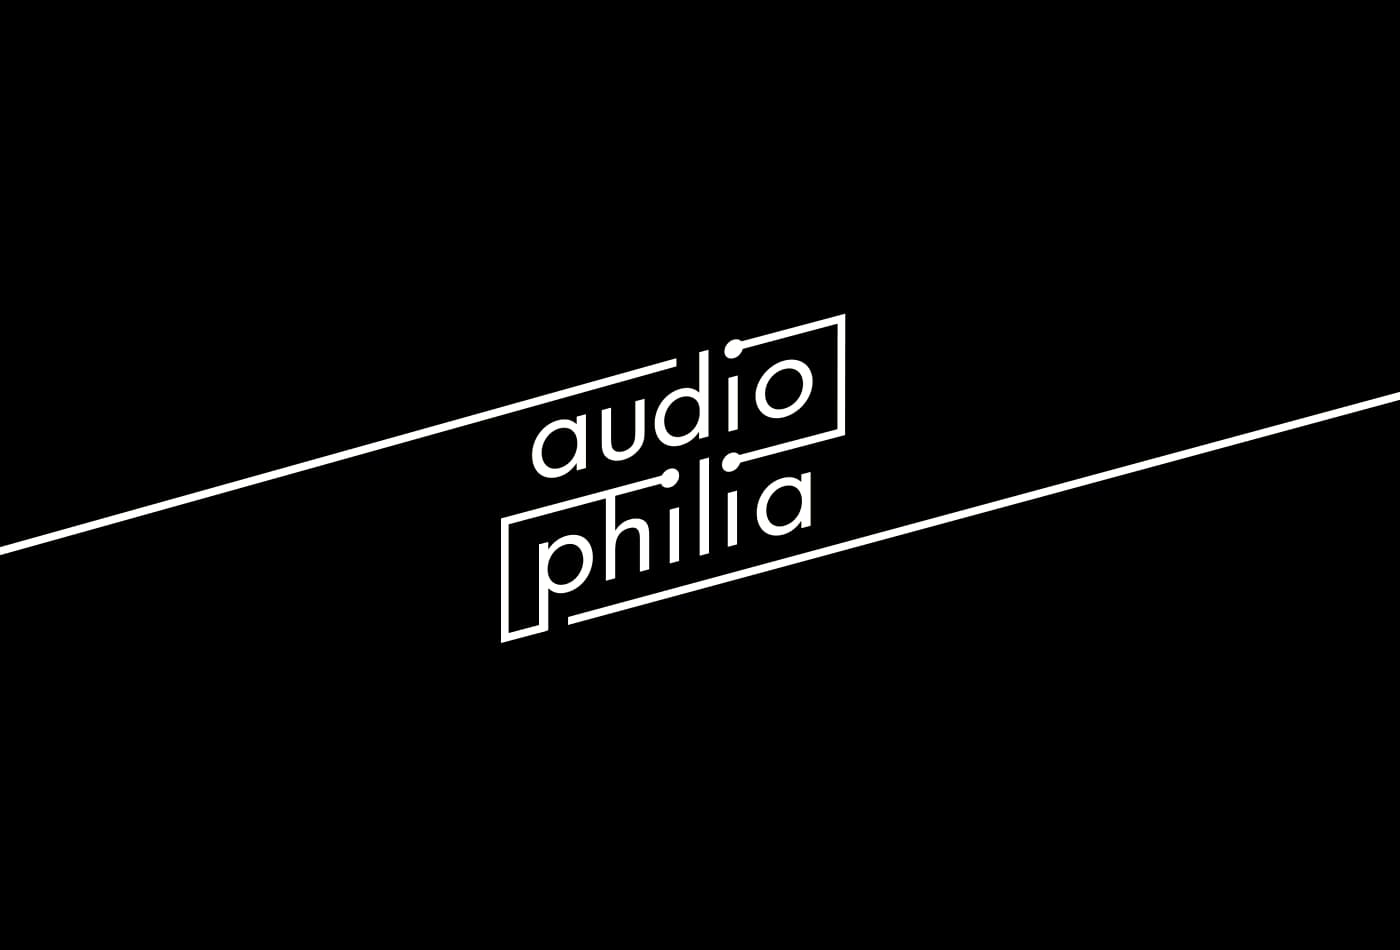 AudioPhilia logo